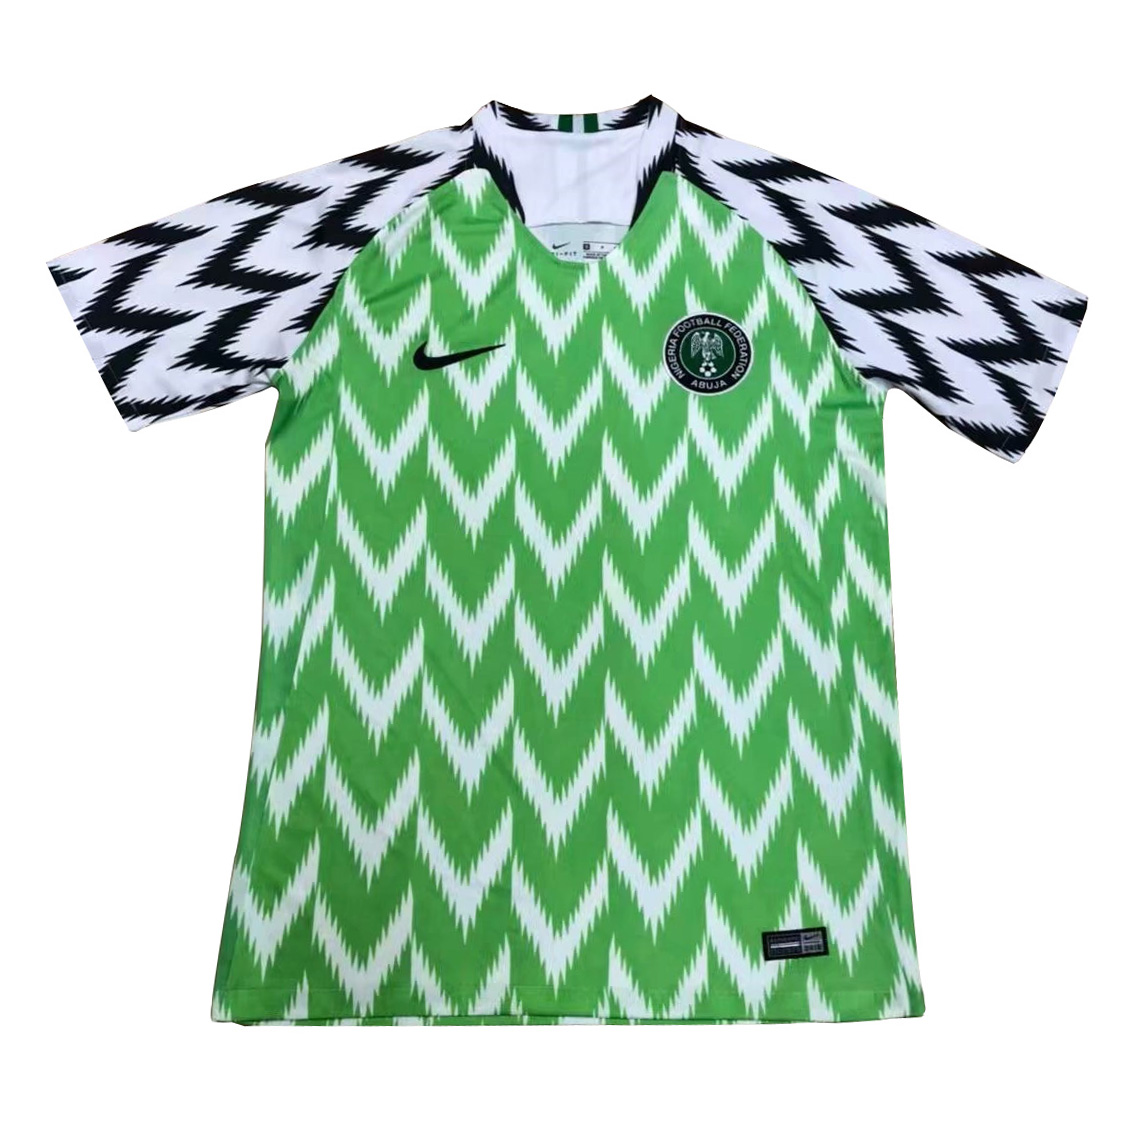 promo code 12f80 bb1ff Nigeria World Cup Jersey